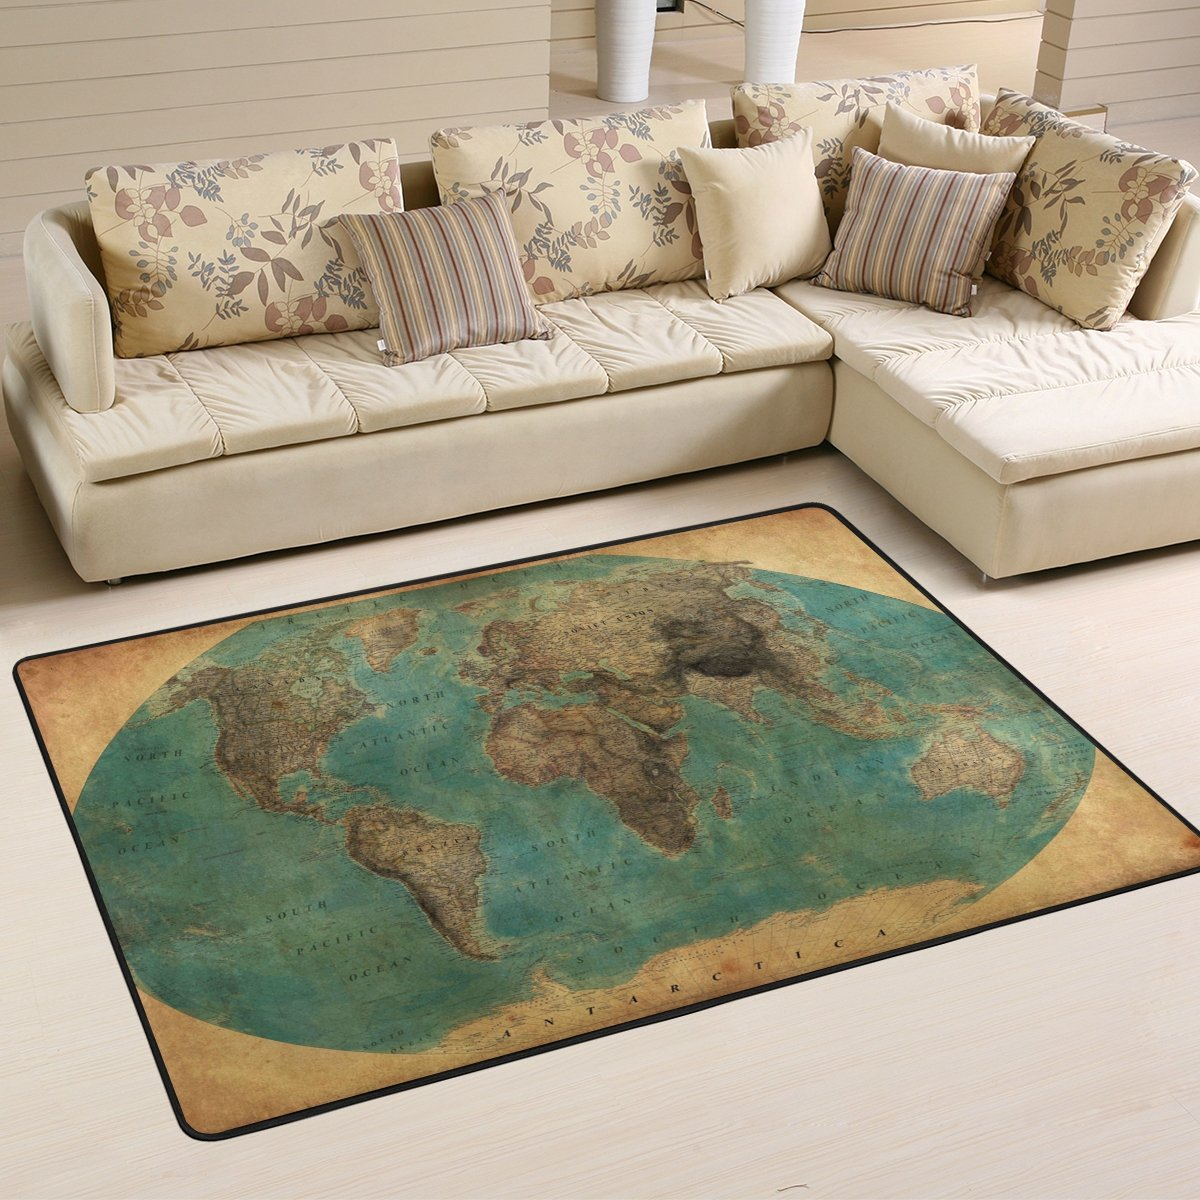 SAVSV 6' x 4' Area Rug Carpet Doormat Lightweight Printed Vintage World Map Easy to Clean For Living Room Bedroom